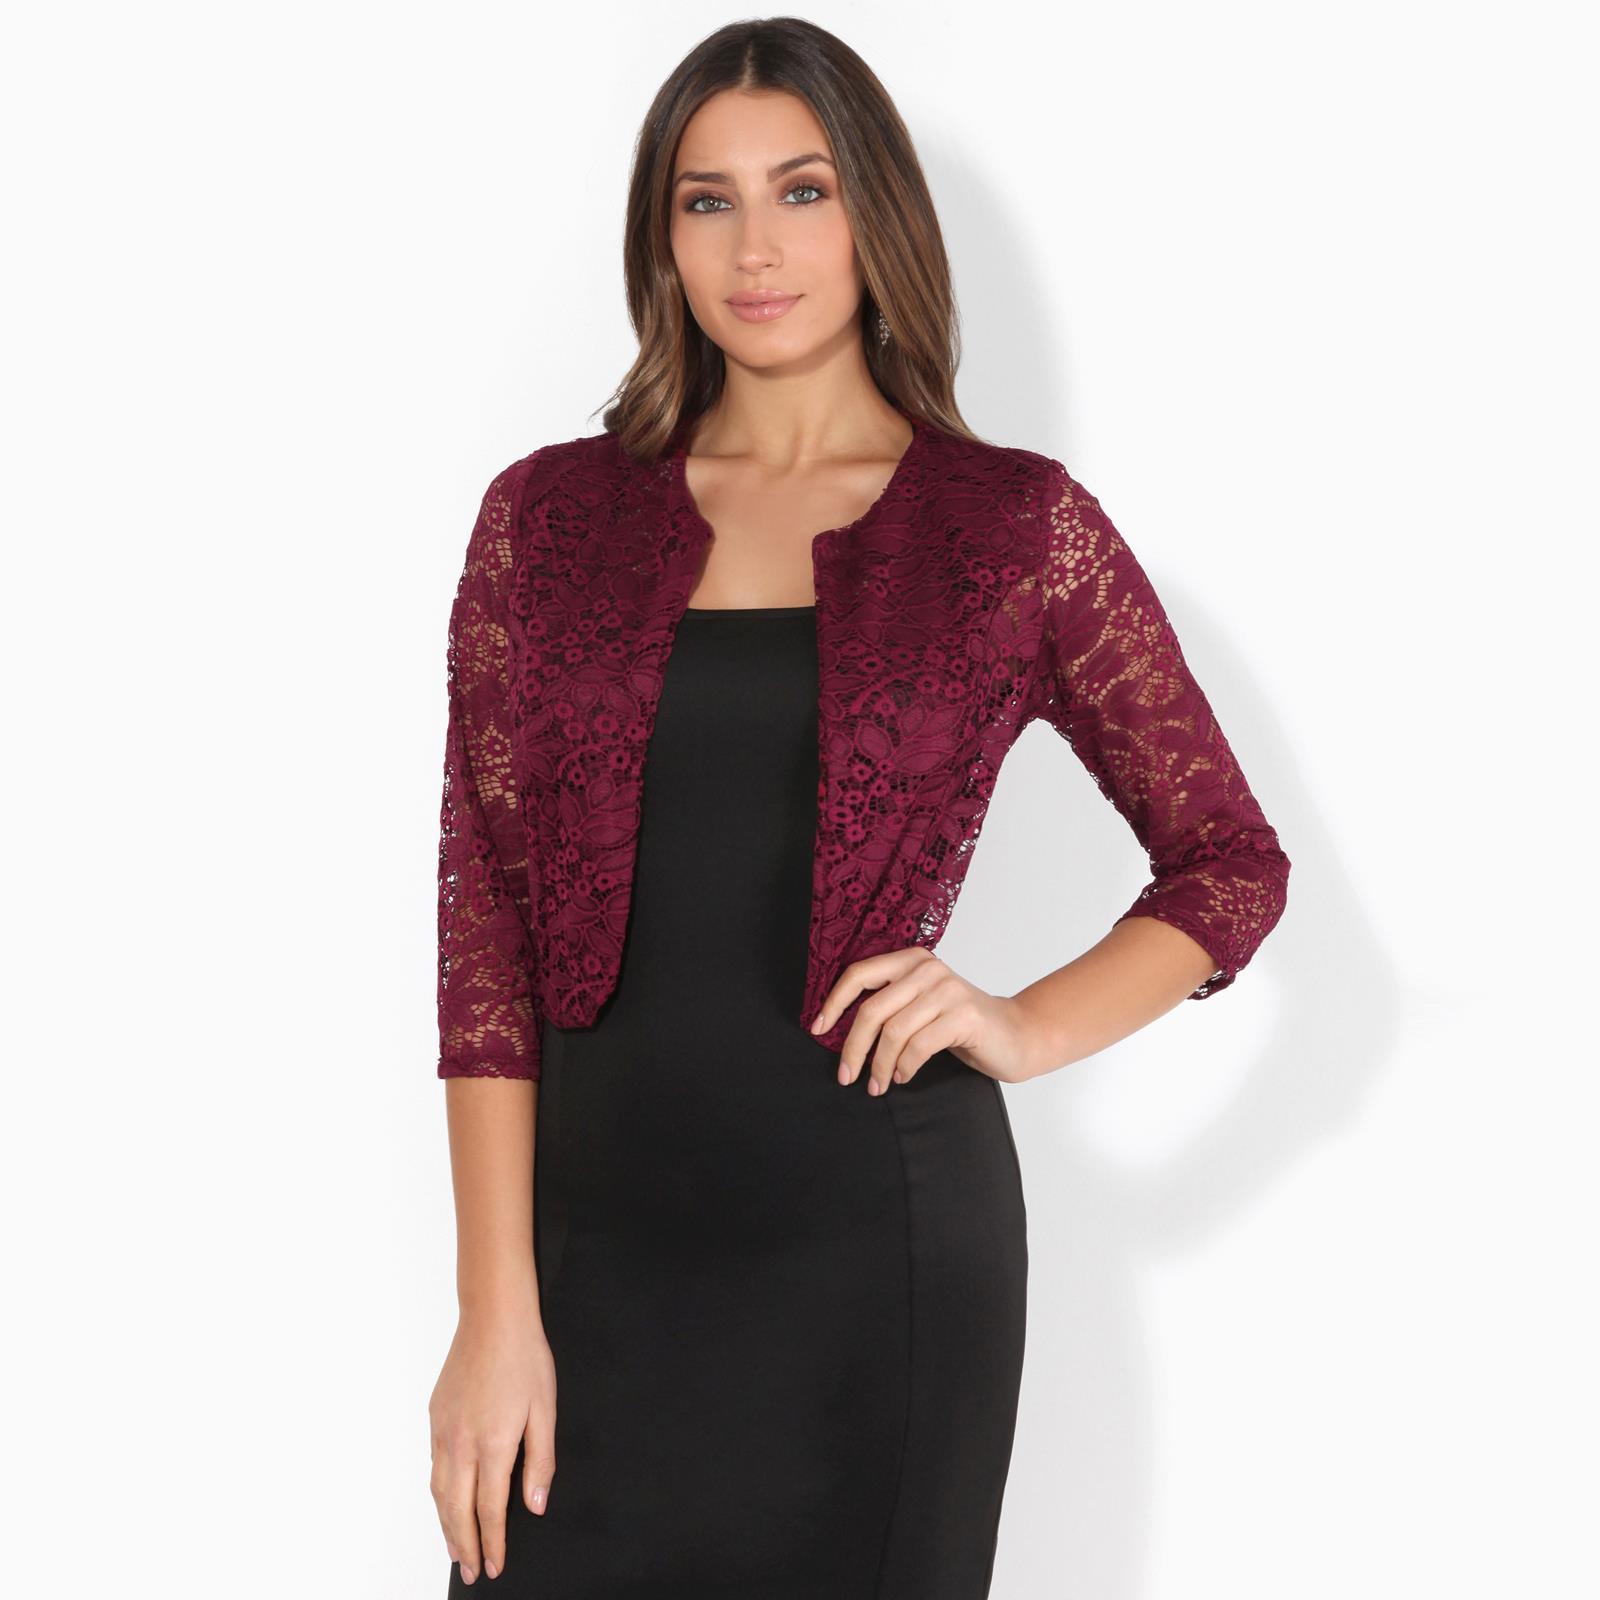 Women-Ladies-Lace-Shrug-Bolero-Crop-Top-Open-Wrap-Jacket-Evening-Party-Wedding thumbnail 15